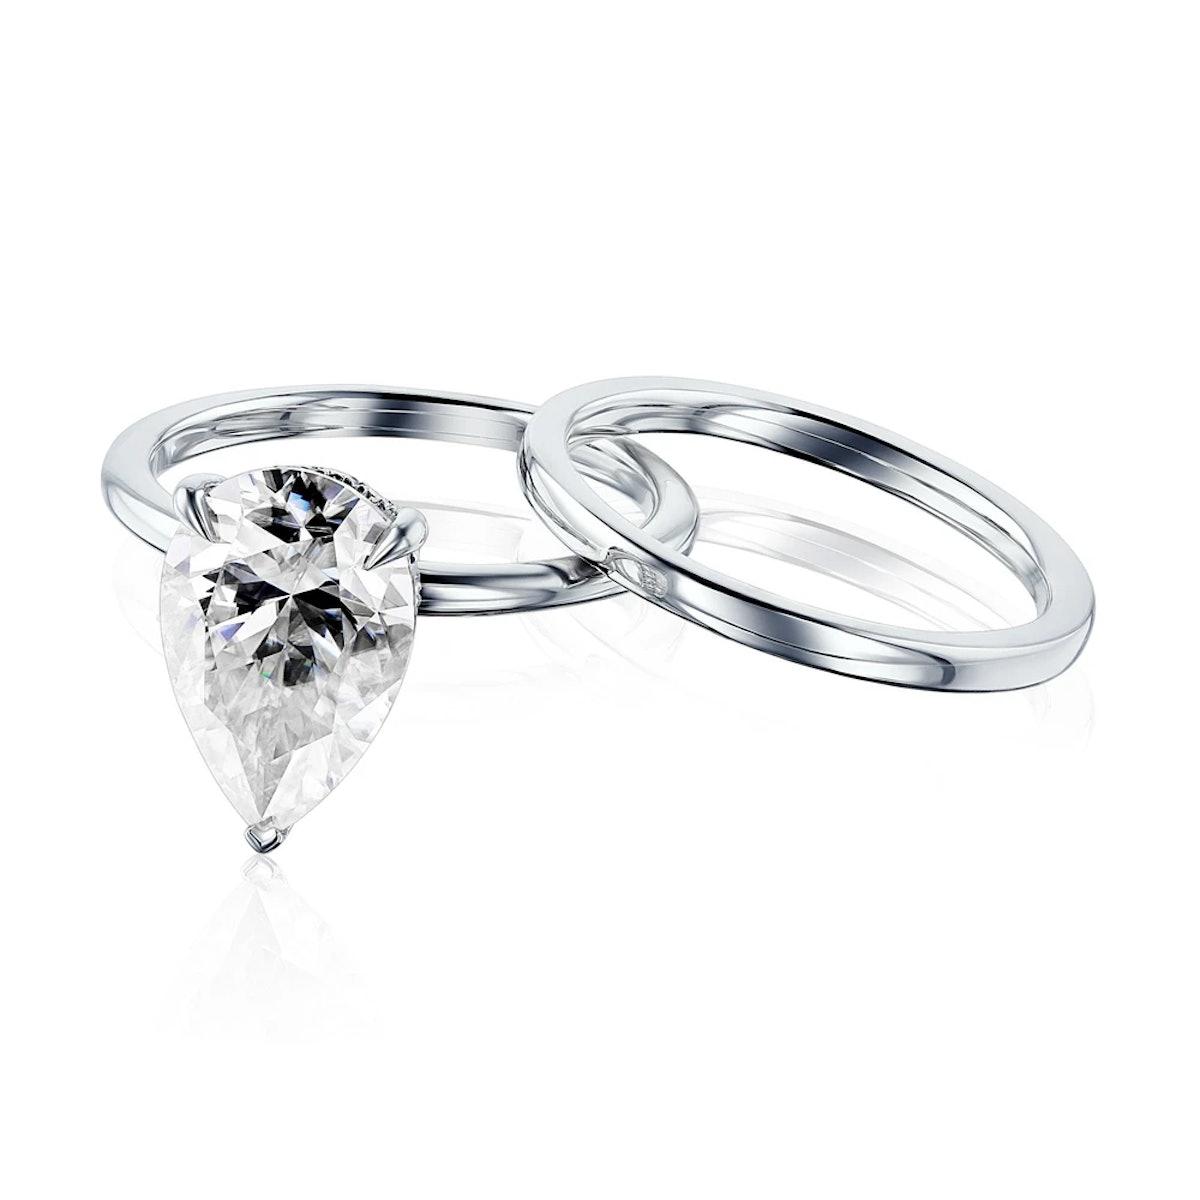 Kobelli's Pear-Shaped Piper Bridal Set with a hidden halo.